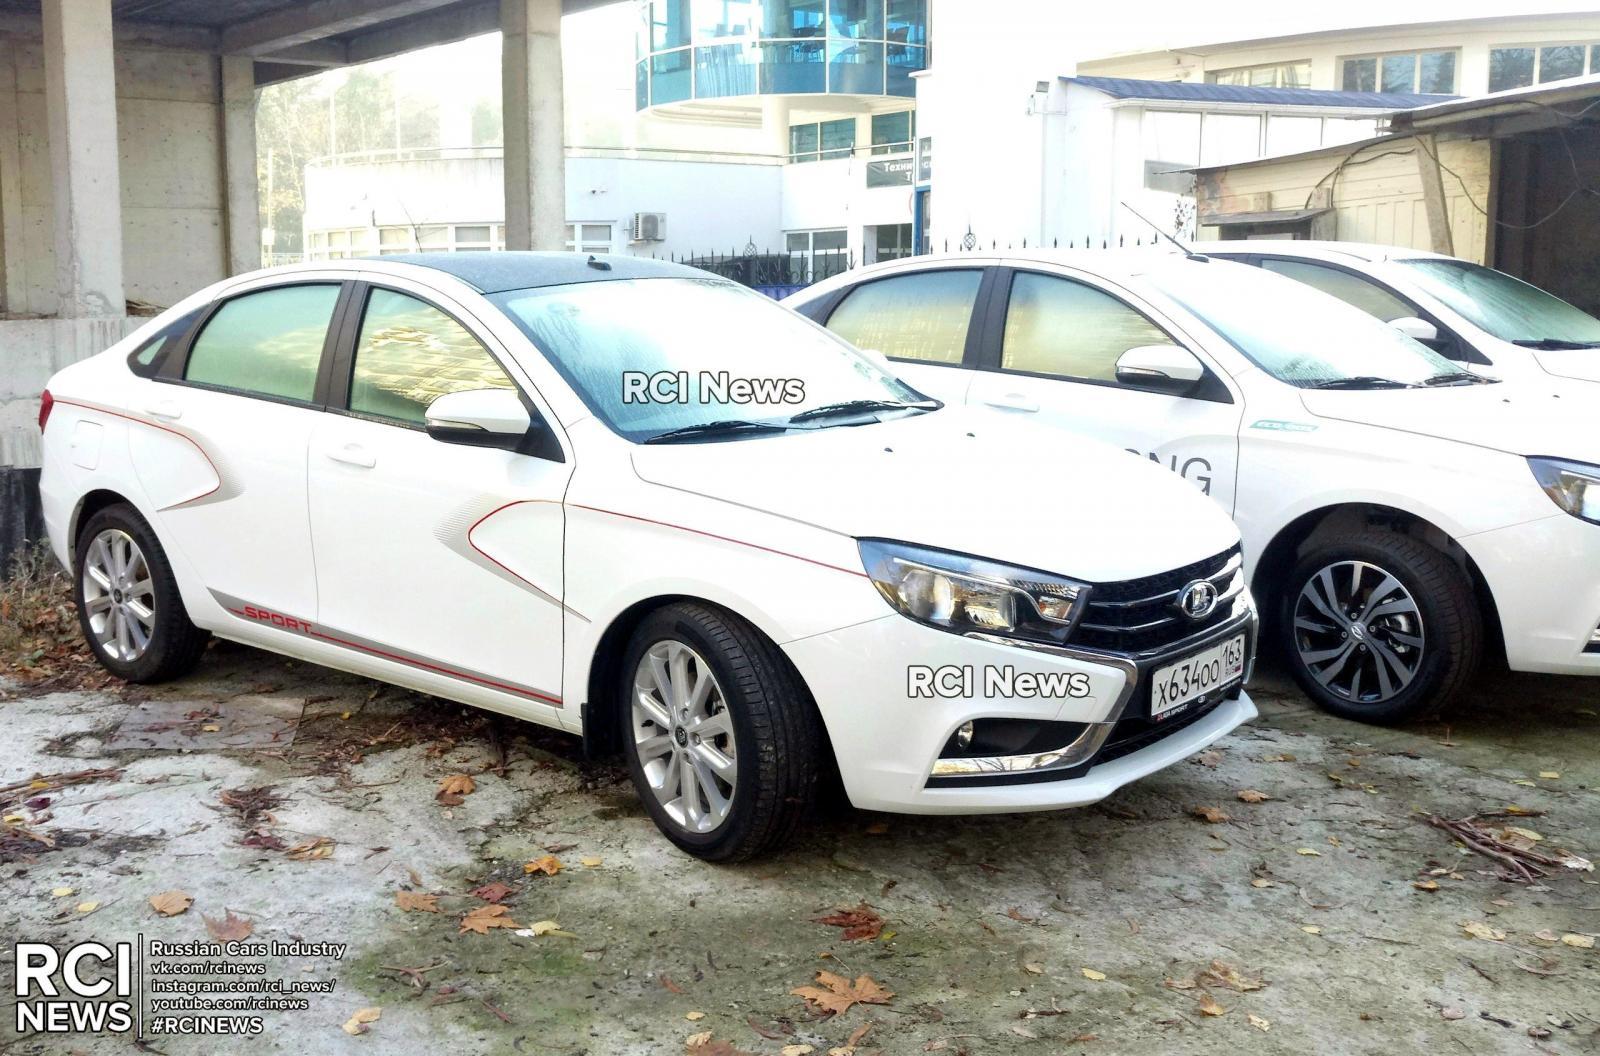 «Ижавто» передаст производство Лада Granta Liftback заводу вТольятти